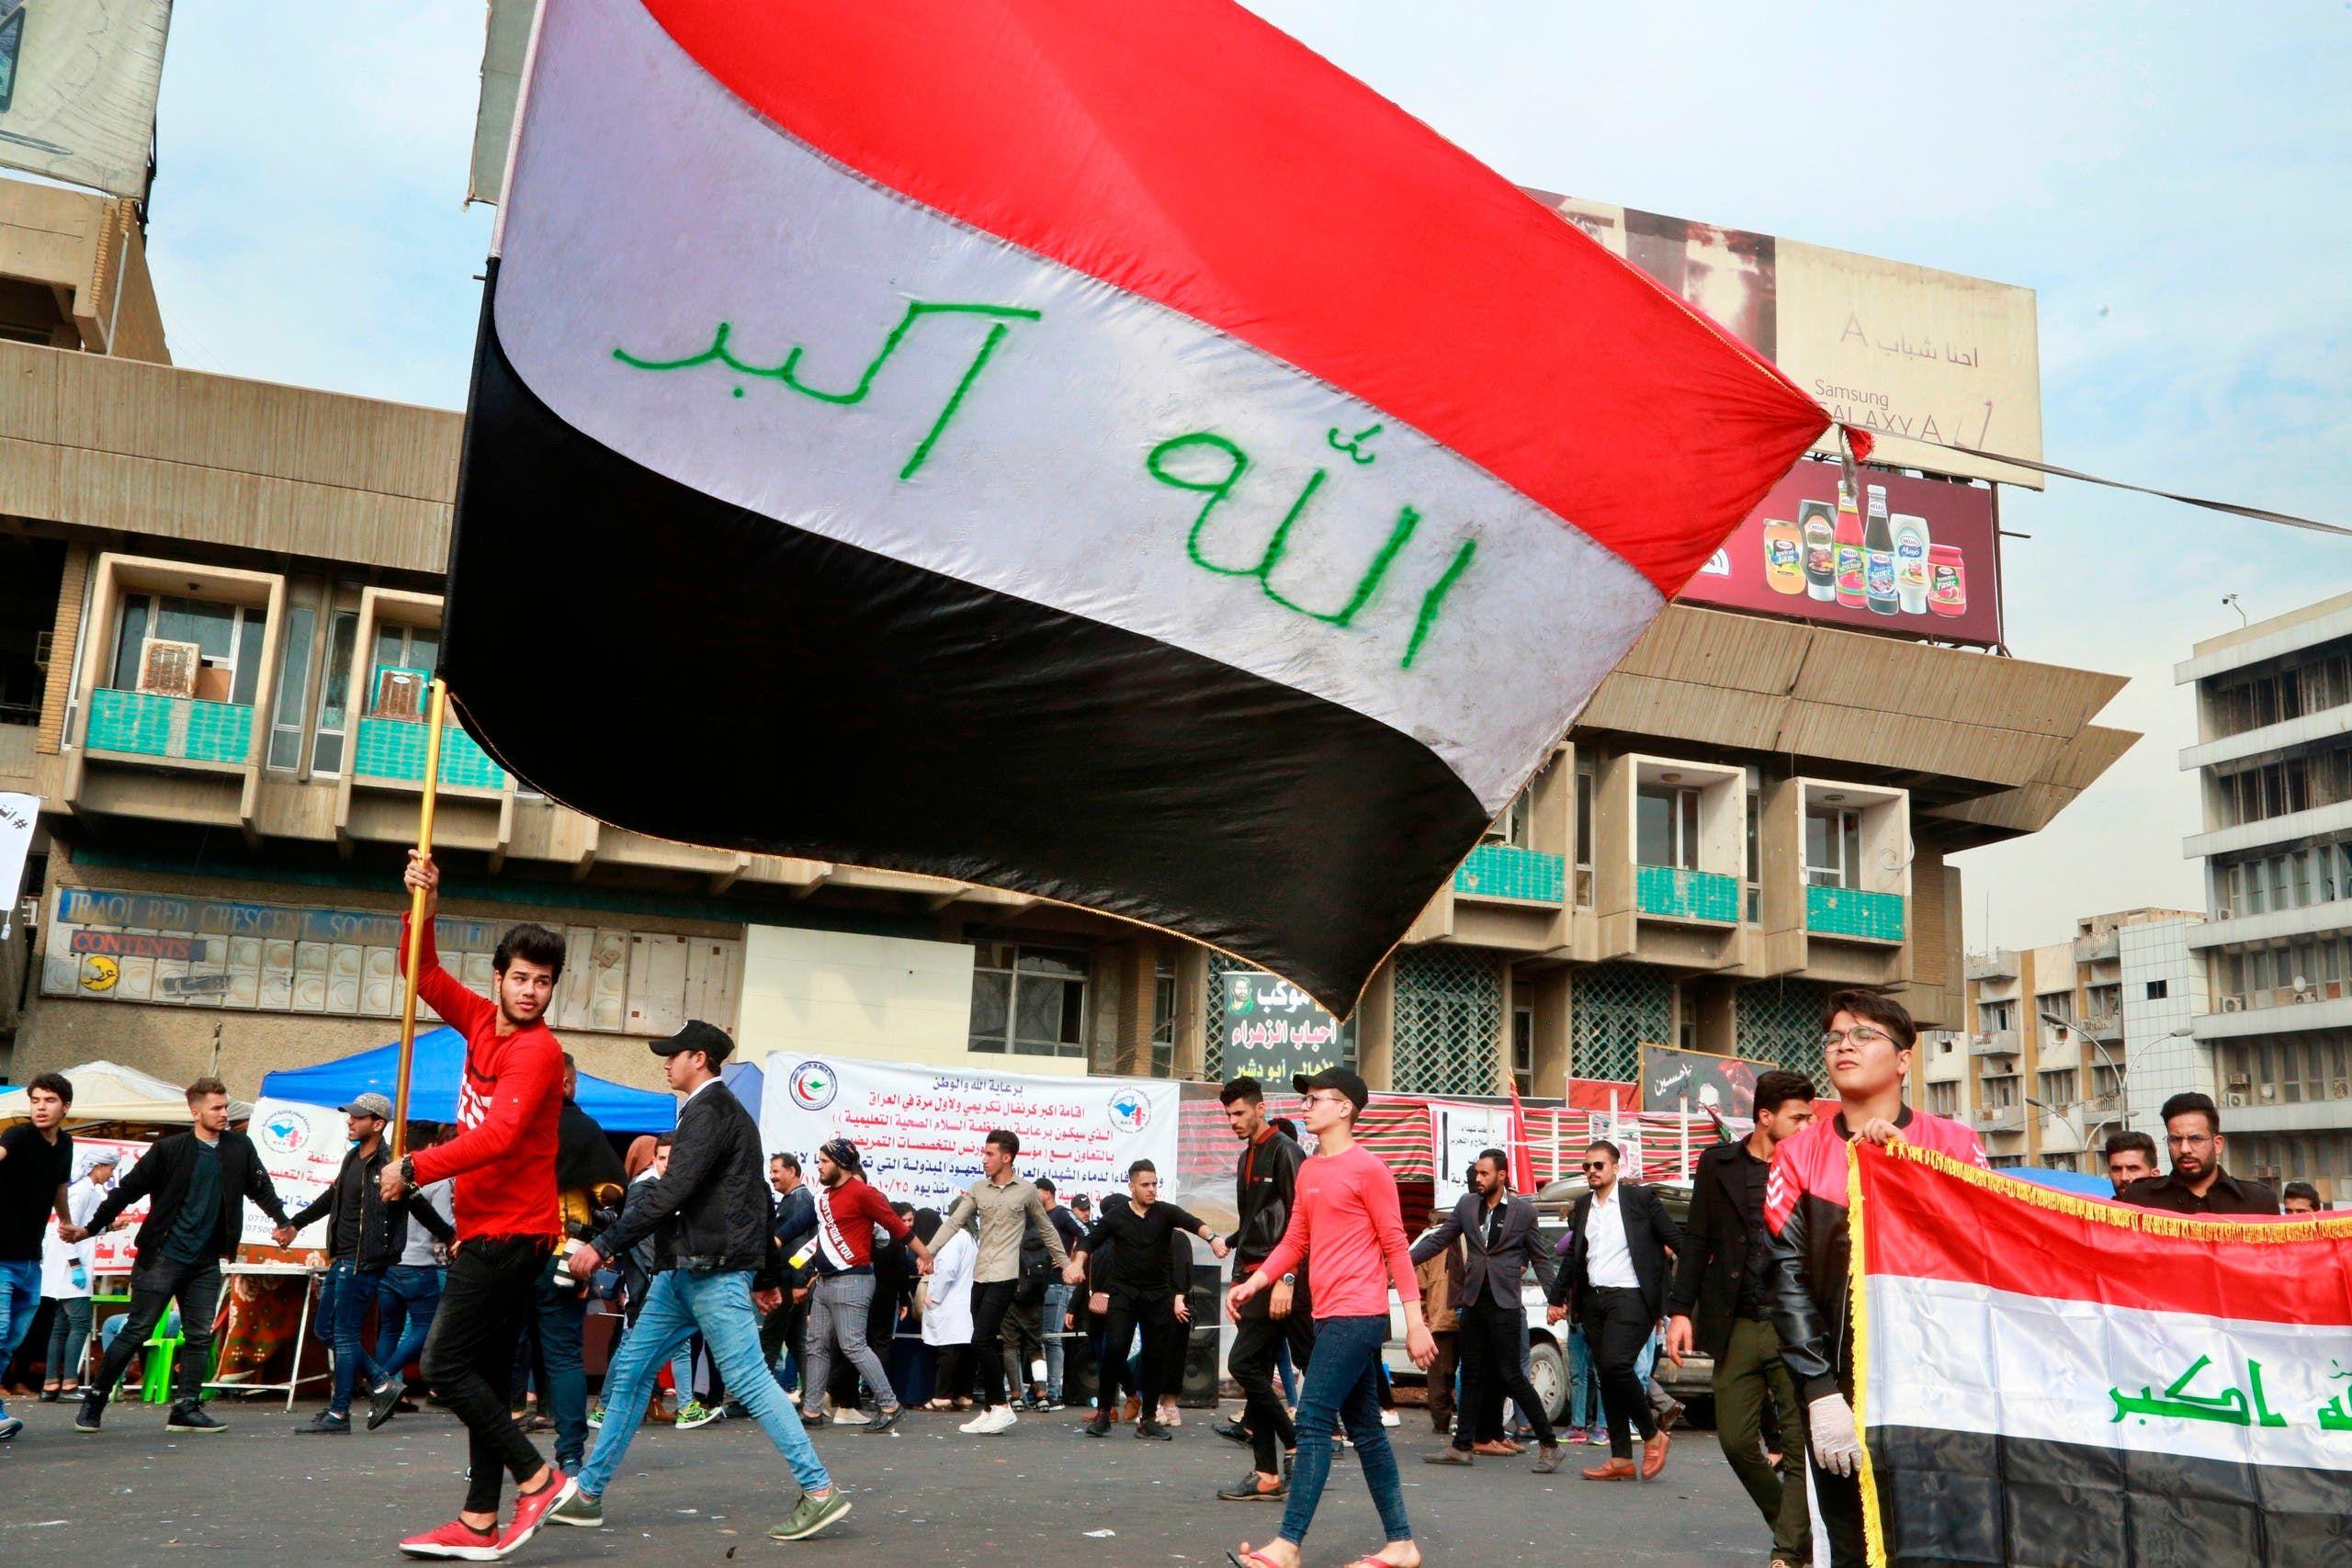 بغداد - اسوشيتد برس